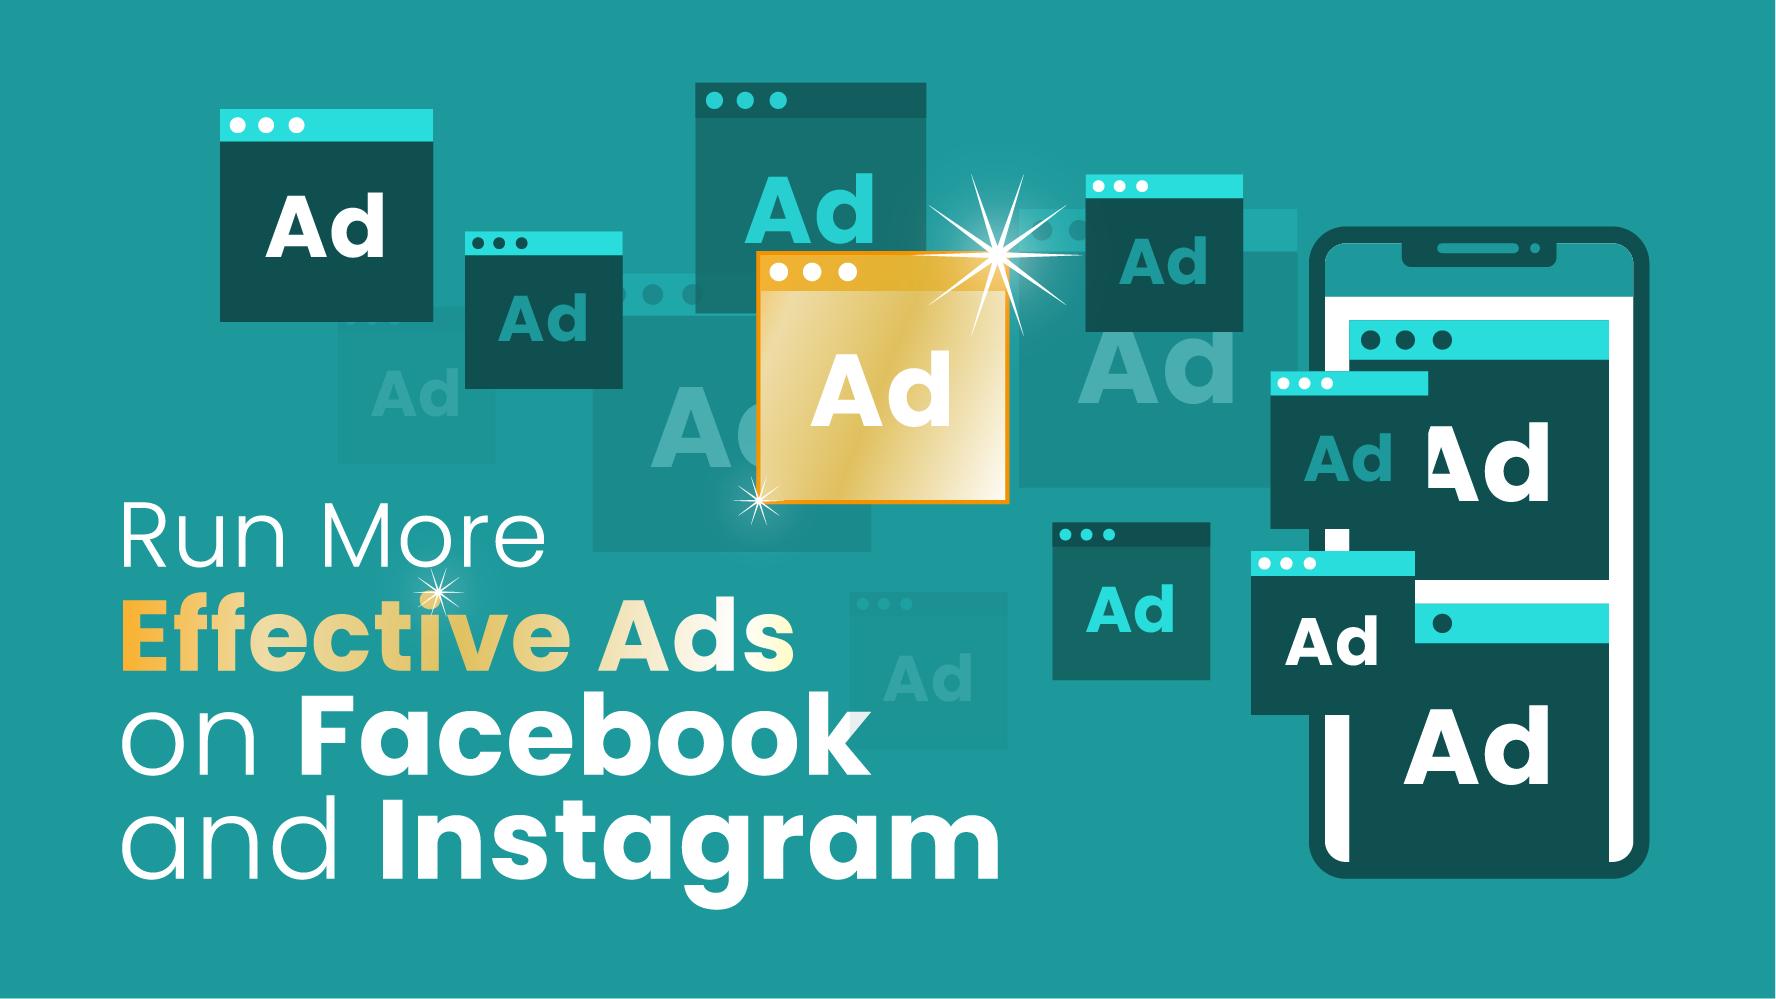 Effective Instagram and Facebook ads